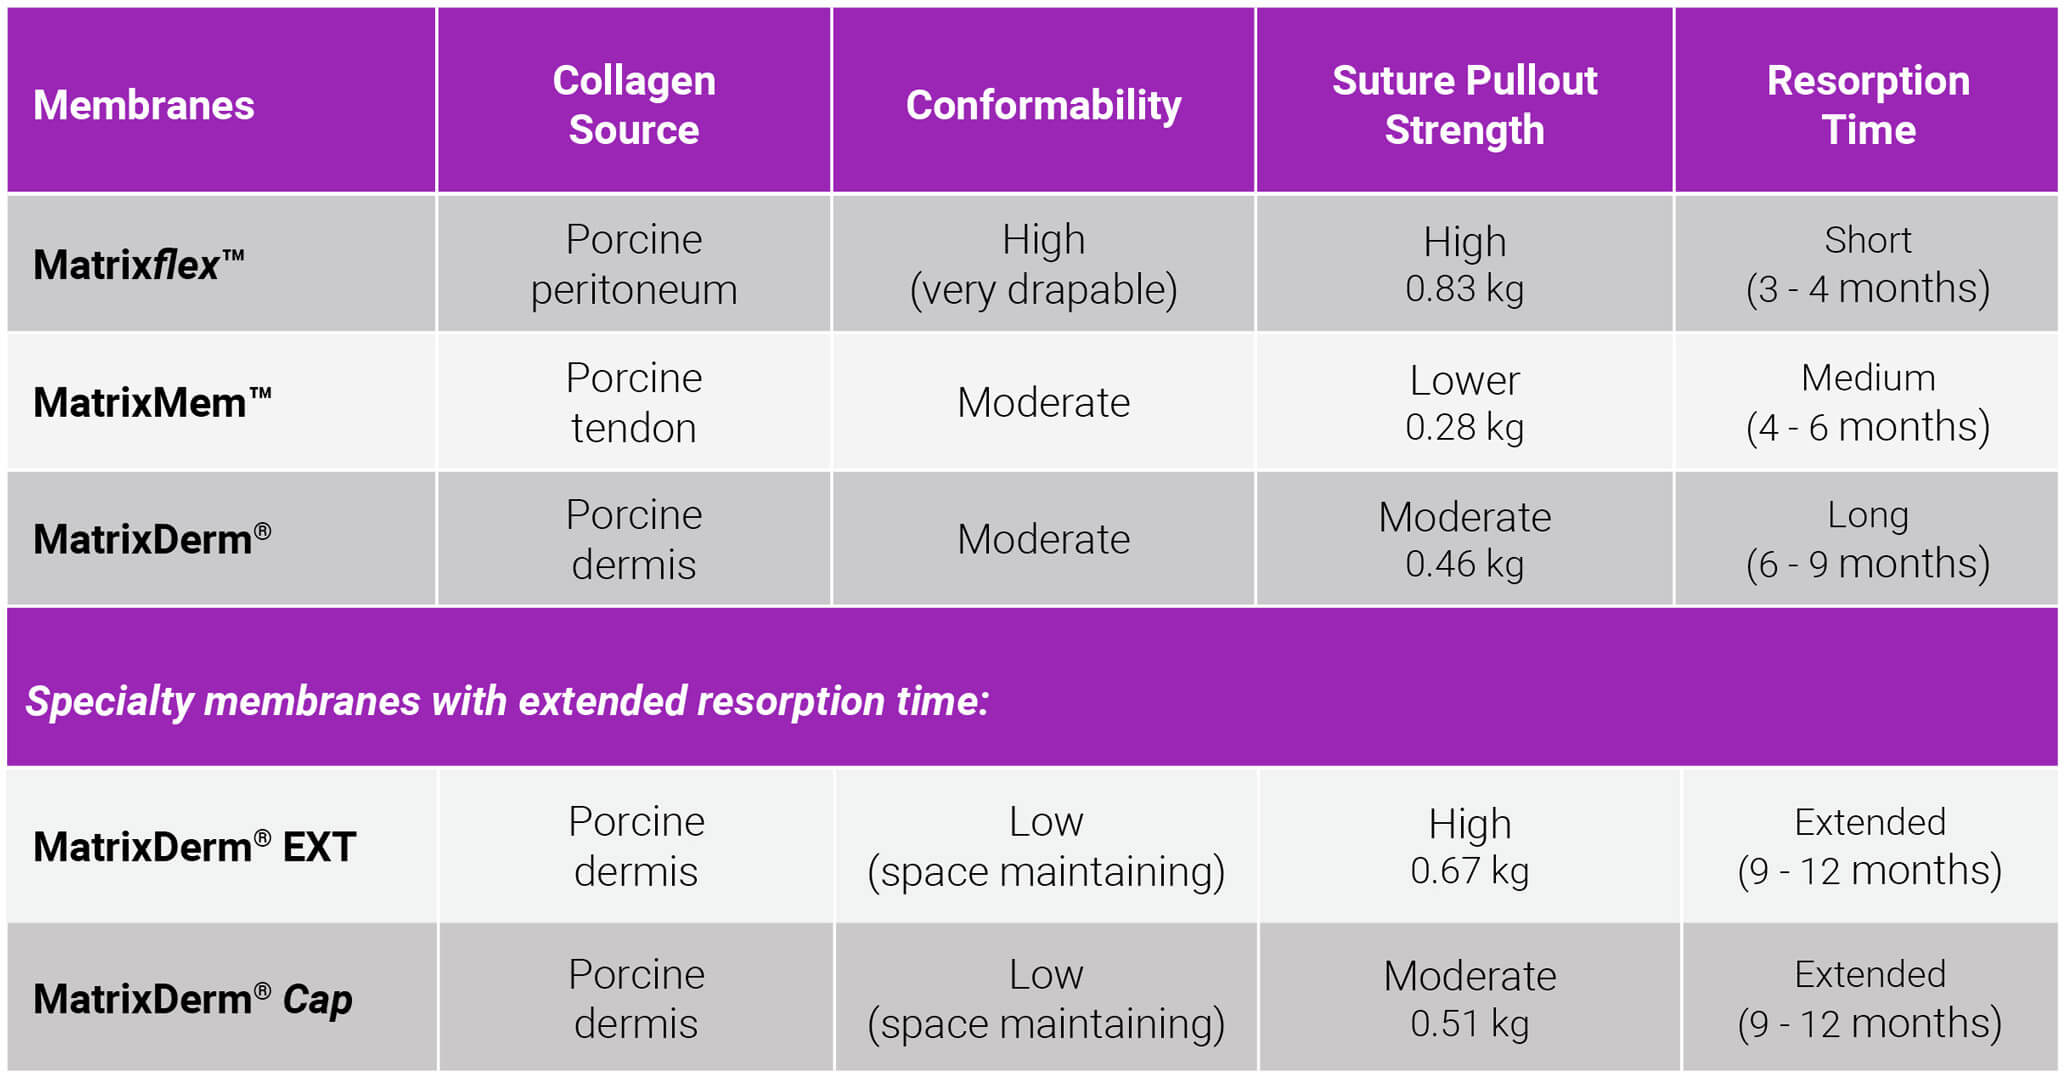 cmx-dental-membranes-chart-lg